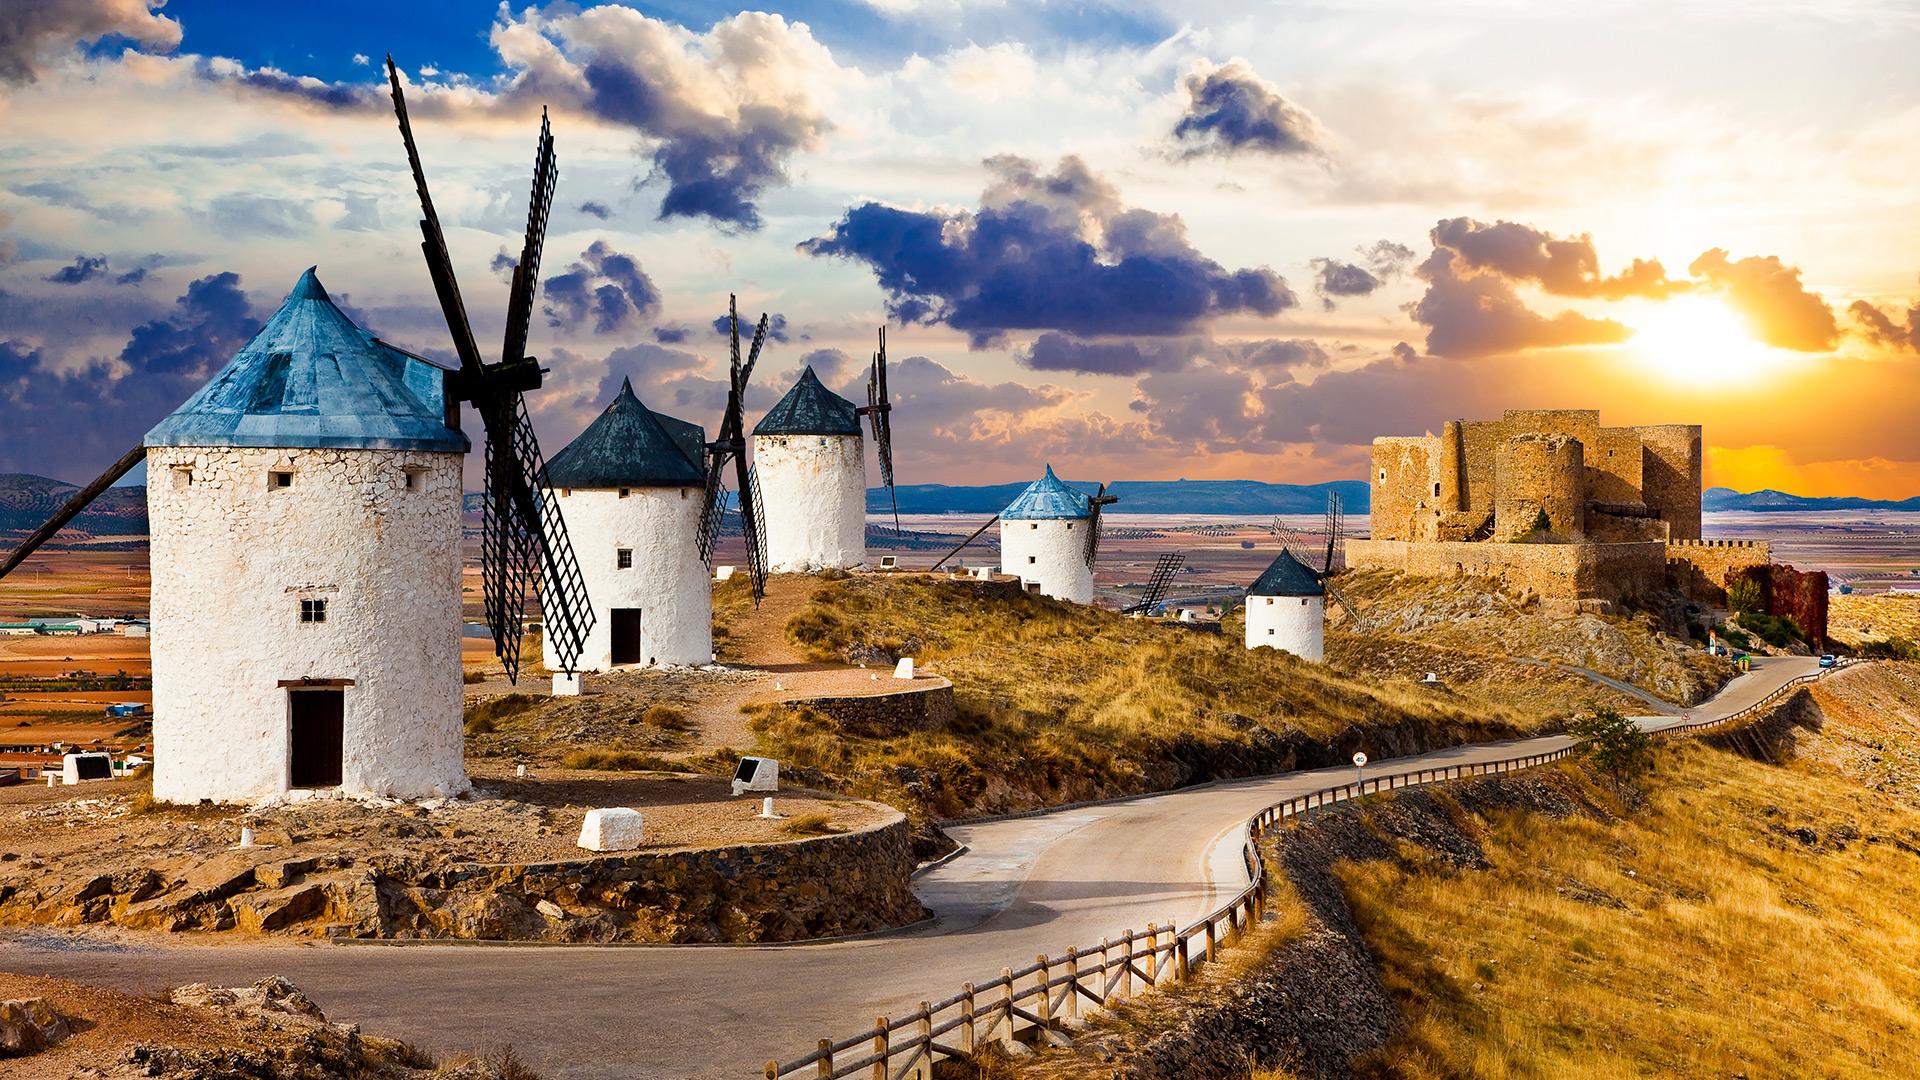 The landscapes of Cervantes